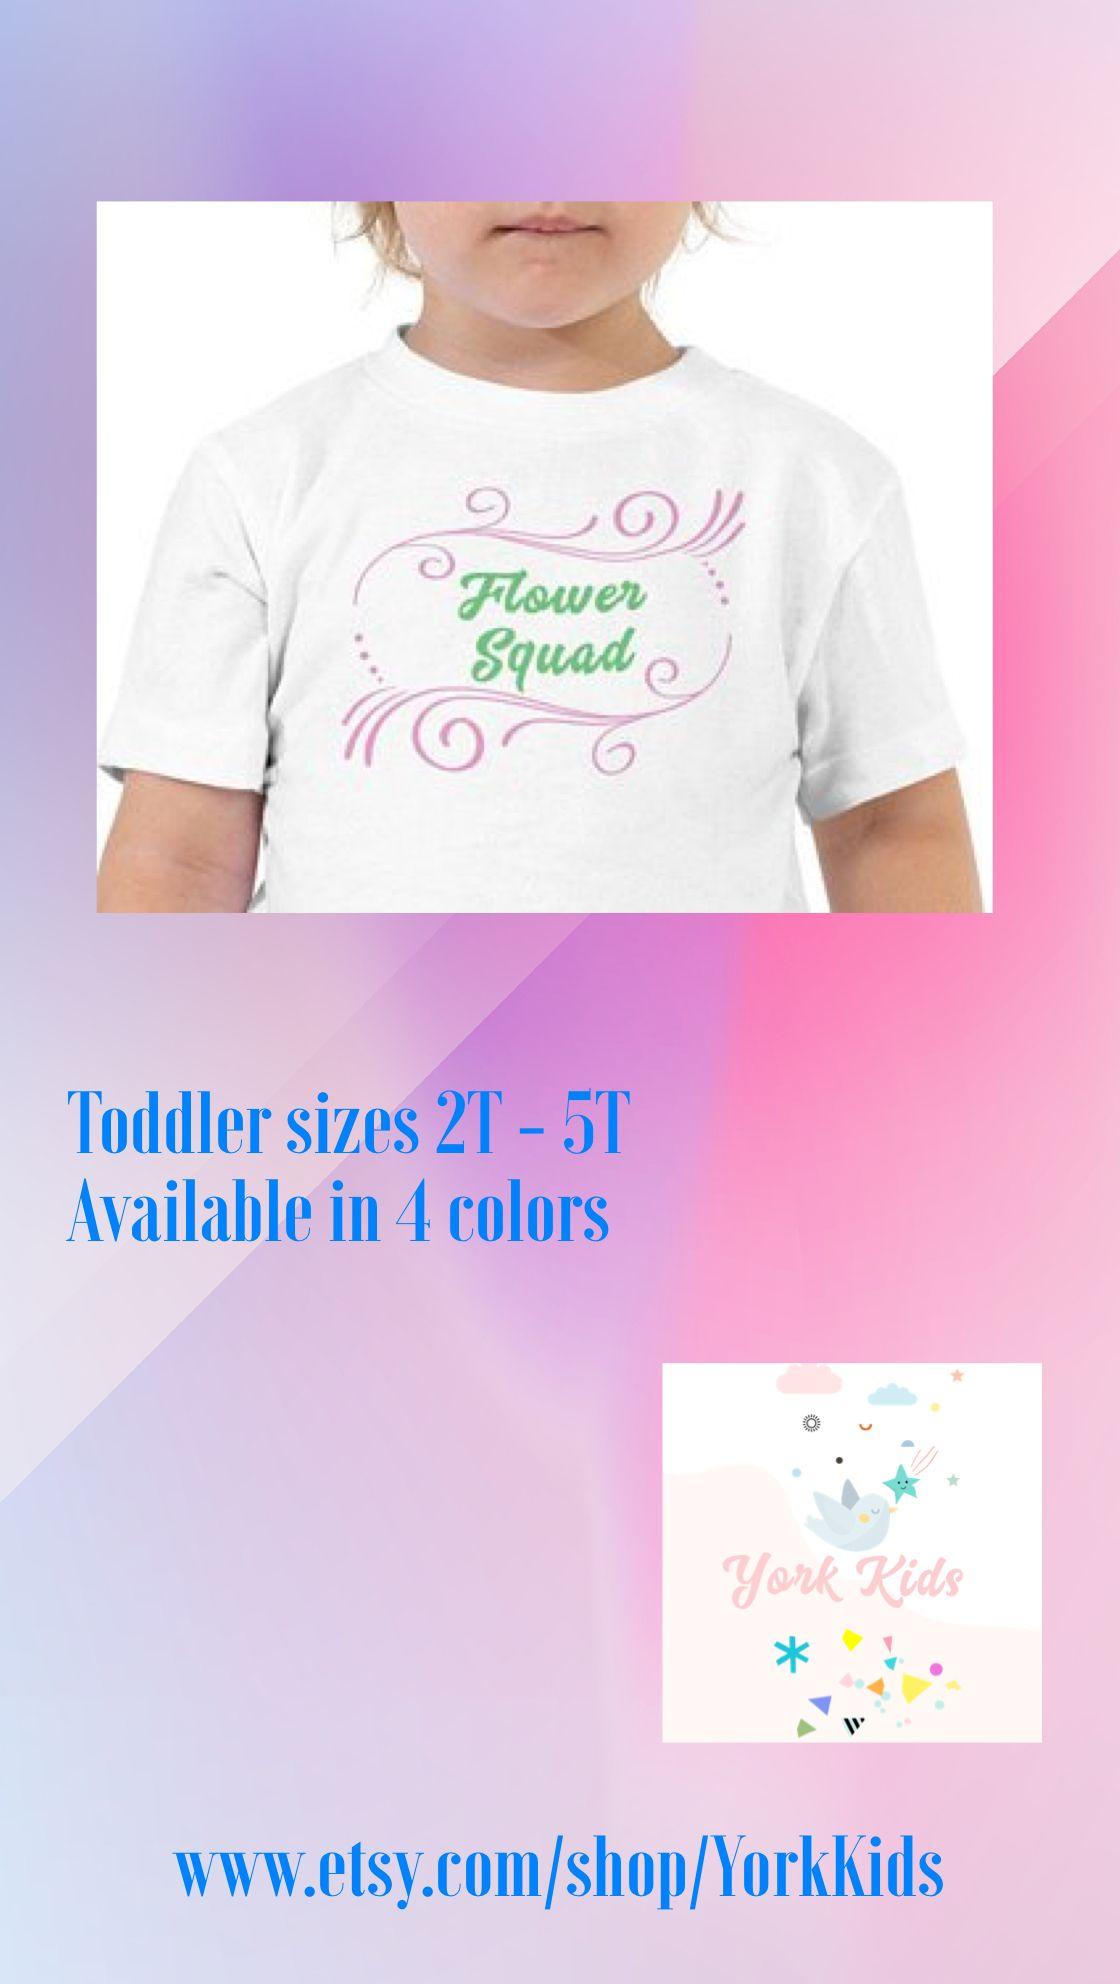 97f8d25be12ed Flower squad toddler tshirt. Flower girl tee. Bridal party wedding ...